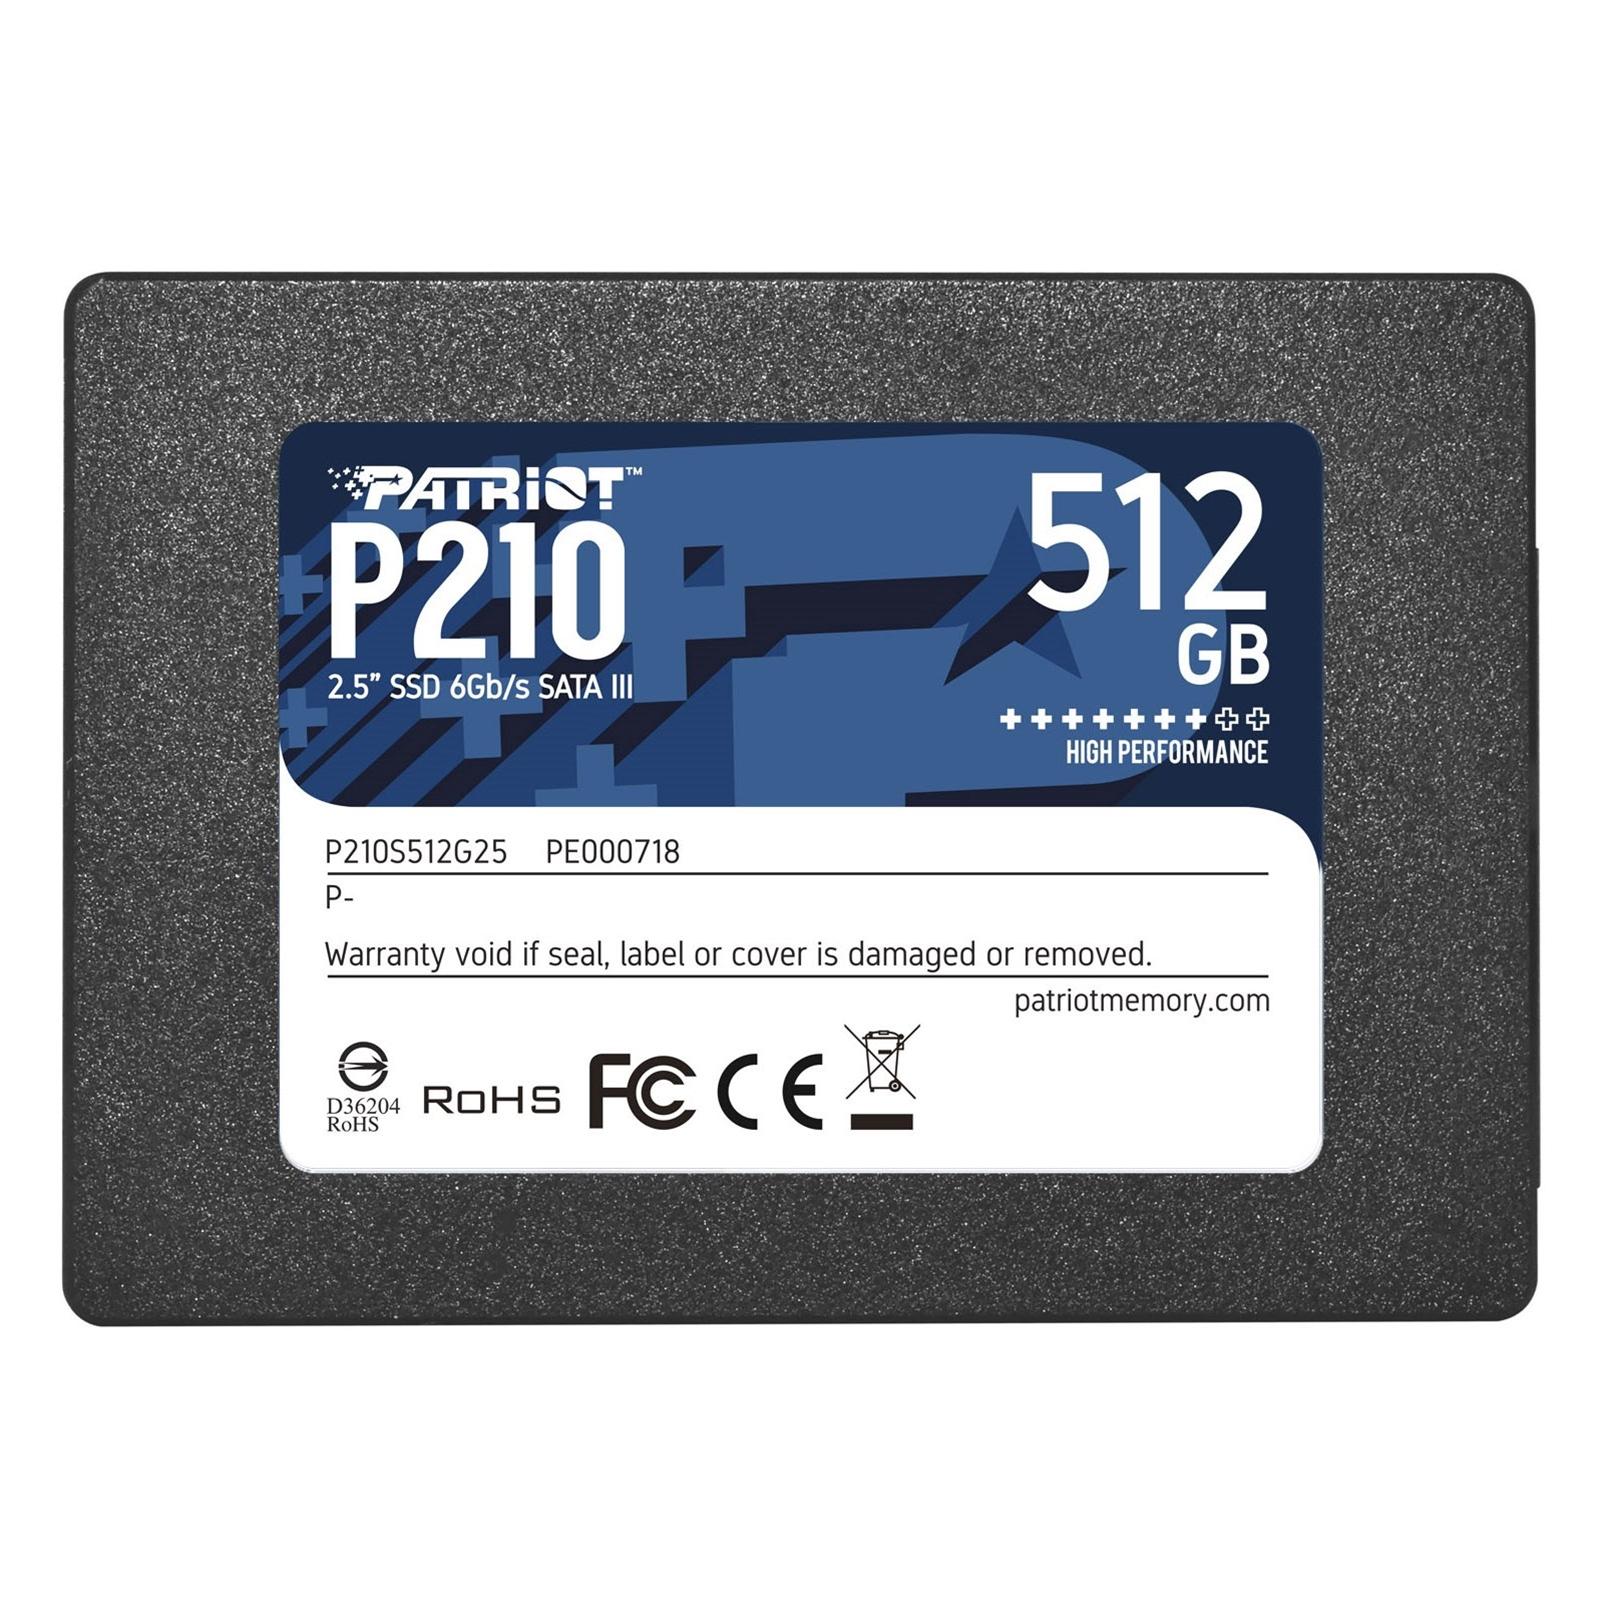 "Patriot P210 512GB 2.5"" SATA III SSD"